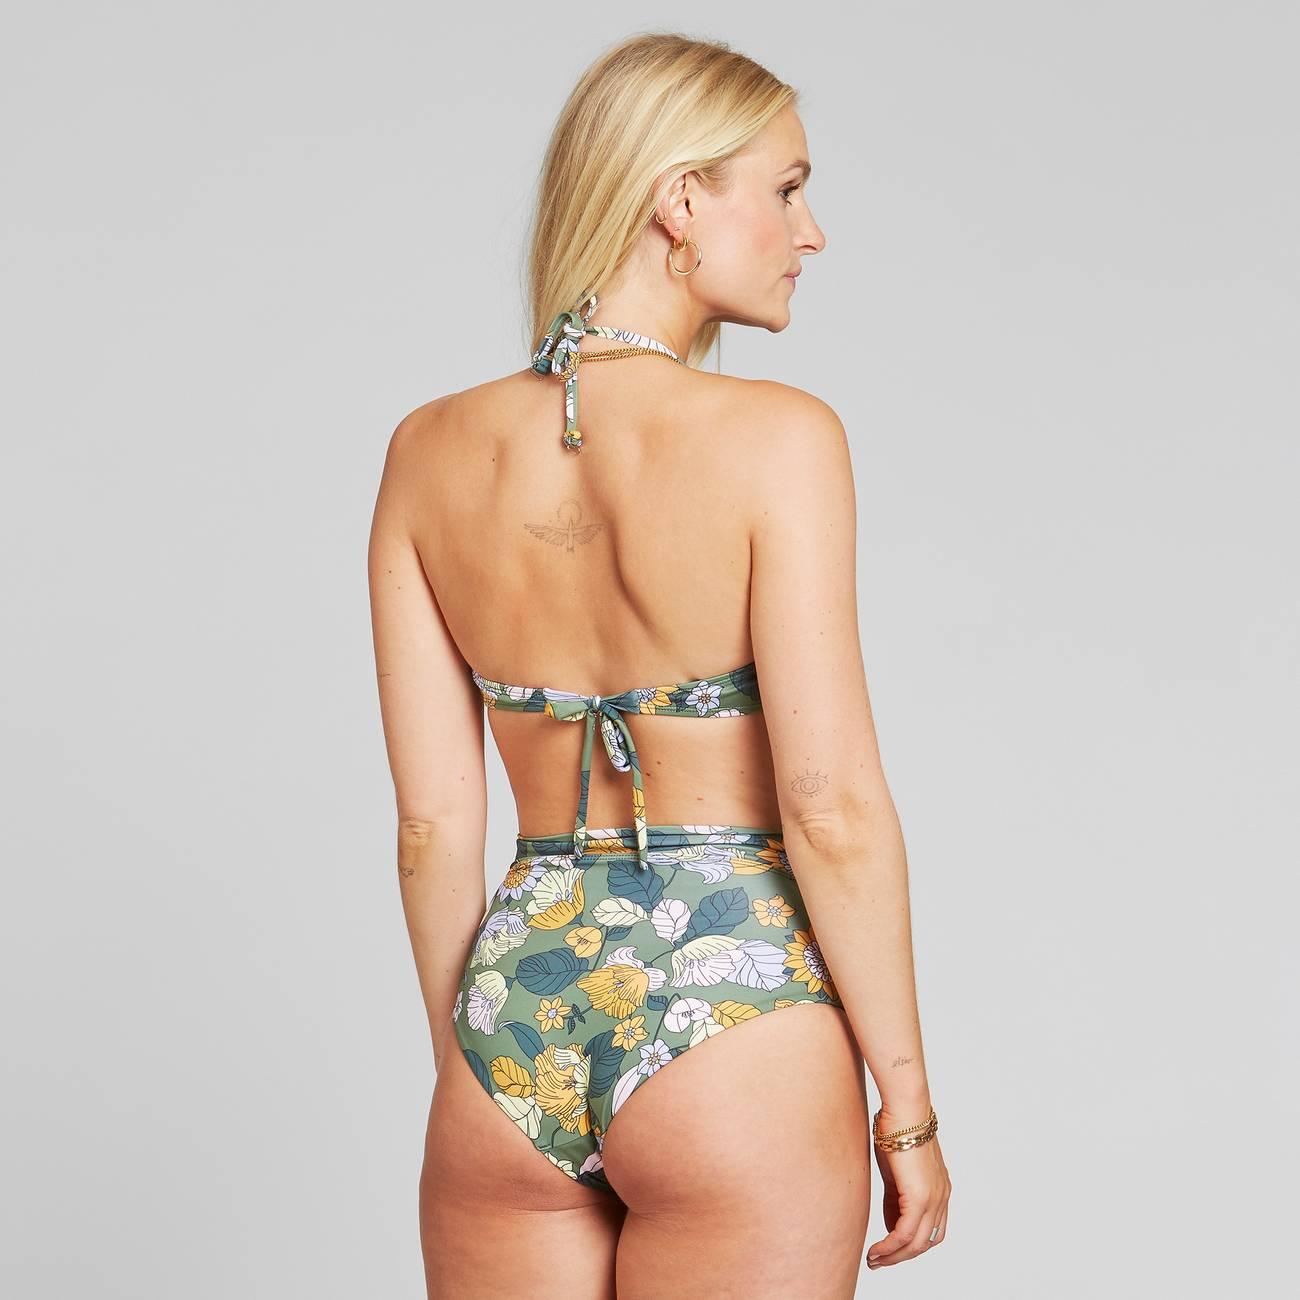 Dedicated - Bikini Top Kovik Seventies Floral Green